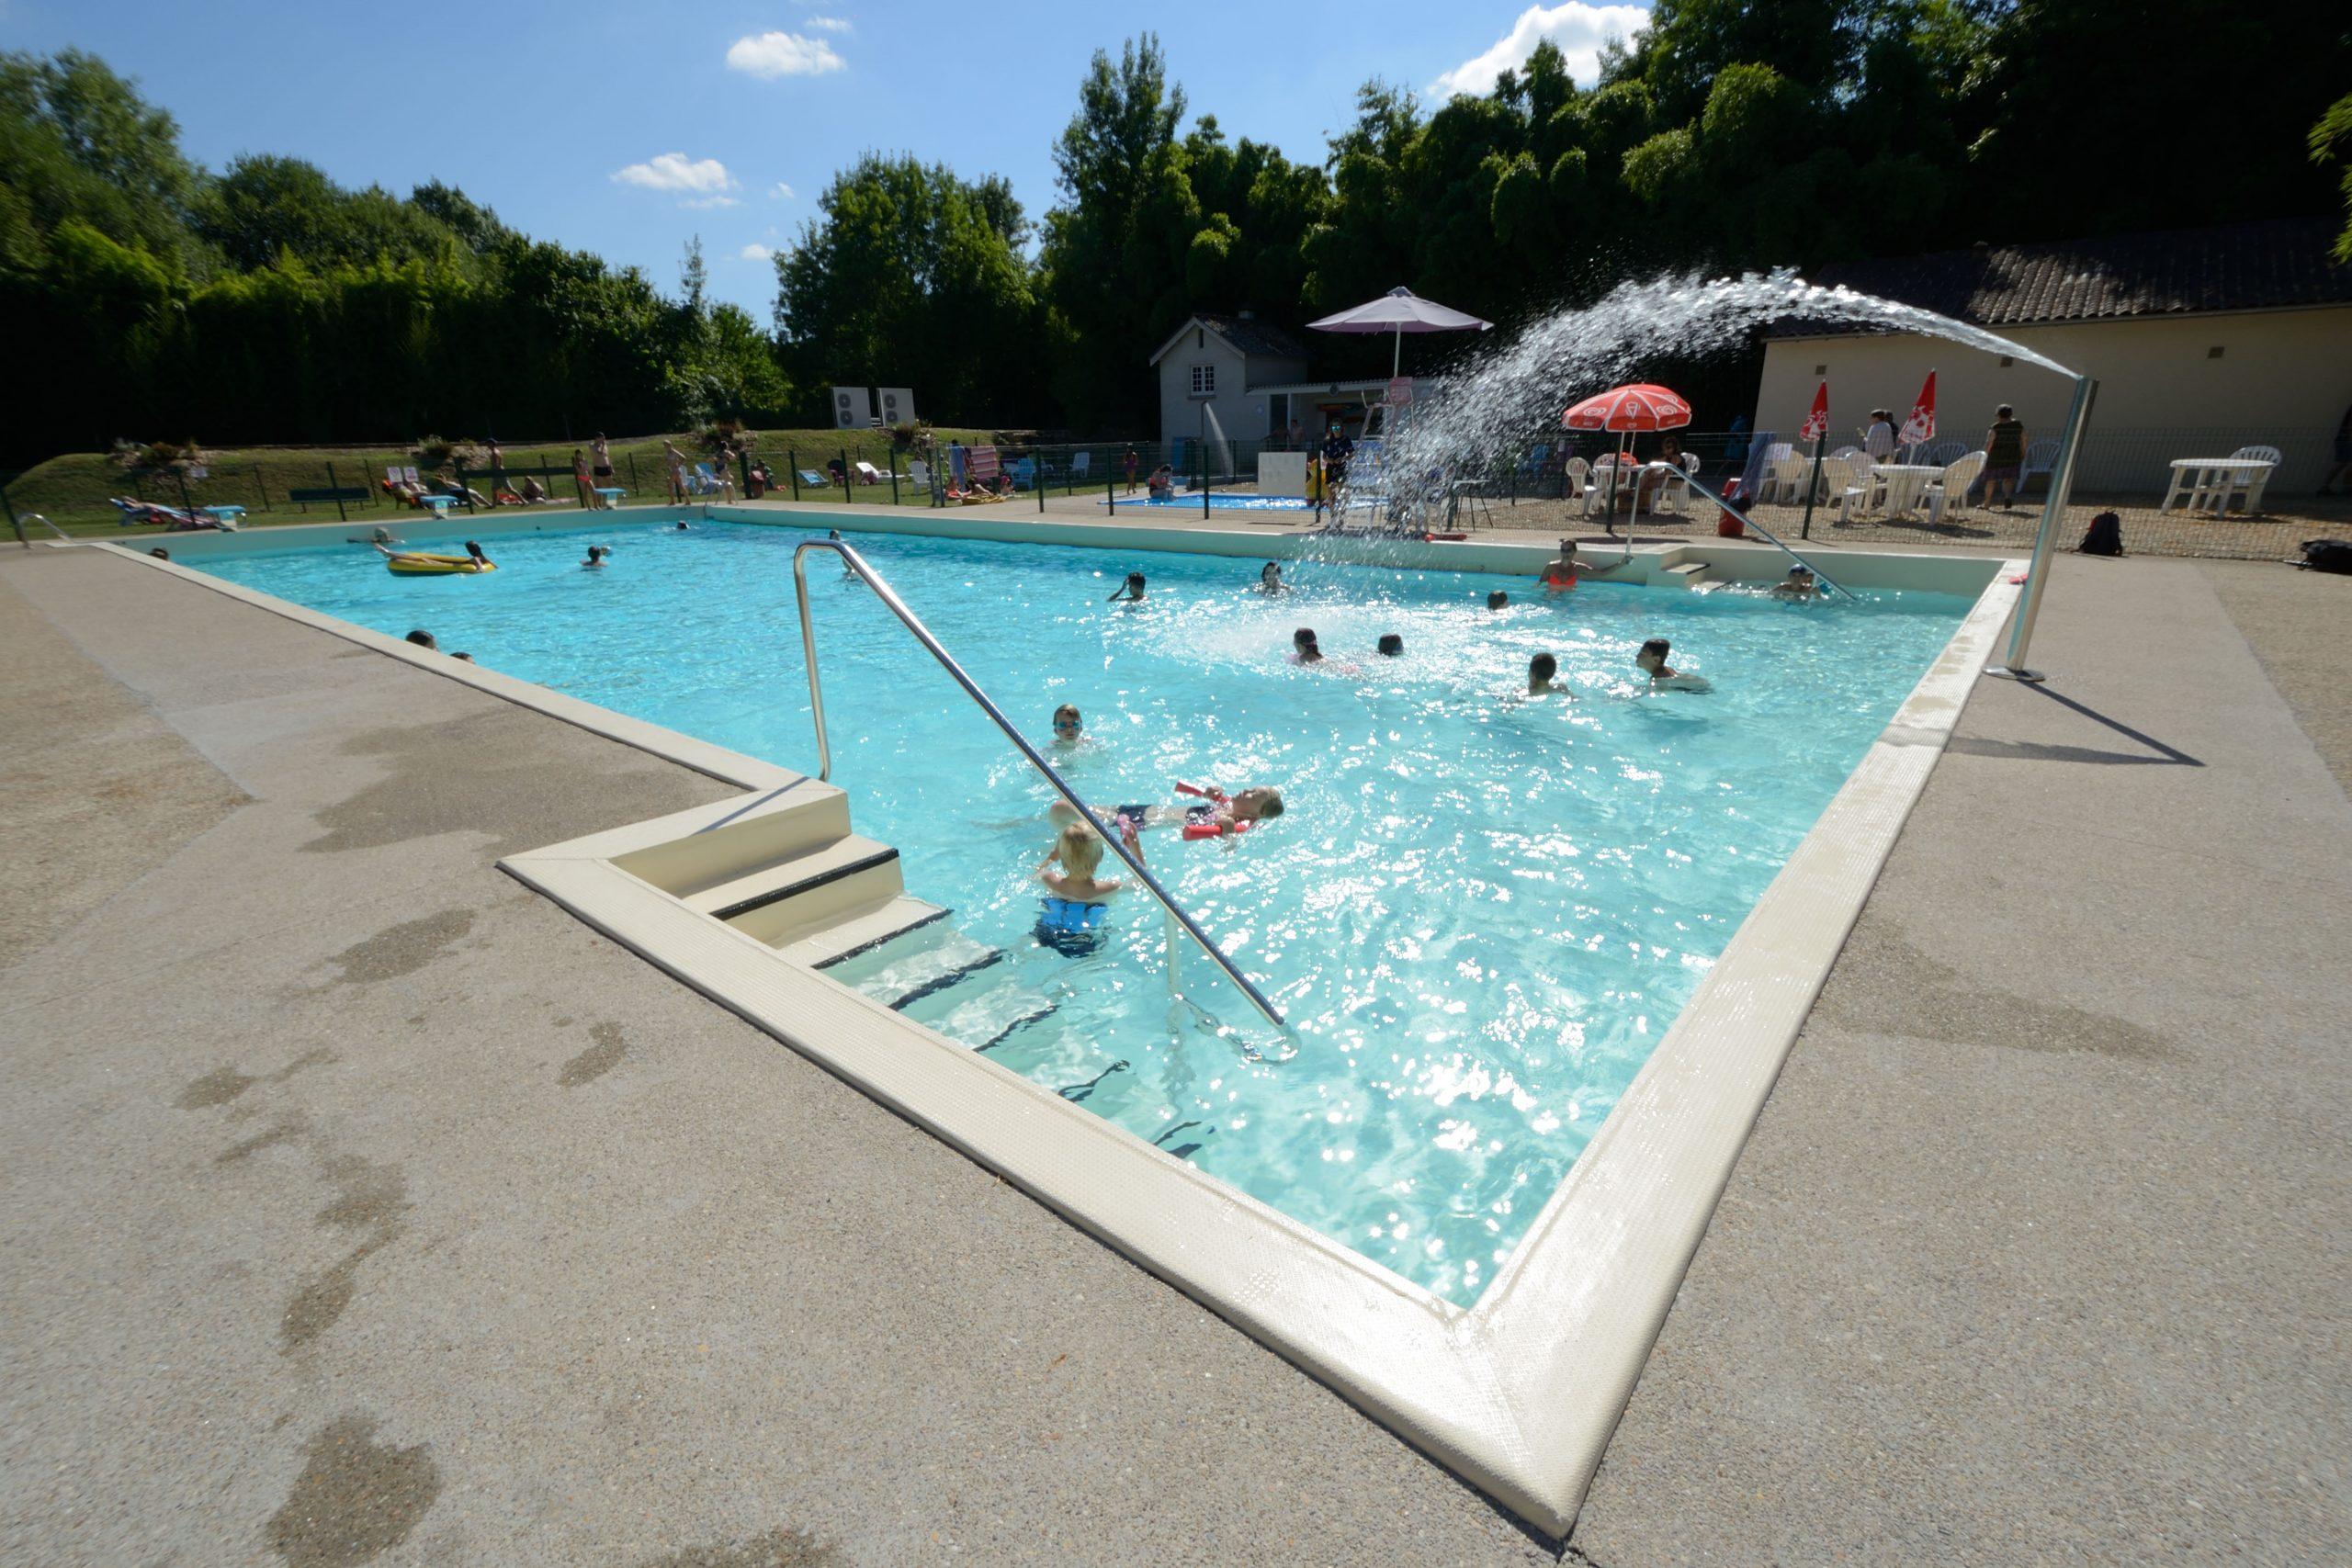 Swimmingpool - Gouex (86 - Vienne) concernant Piscine De Vienne